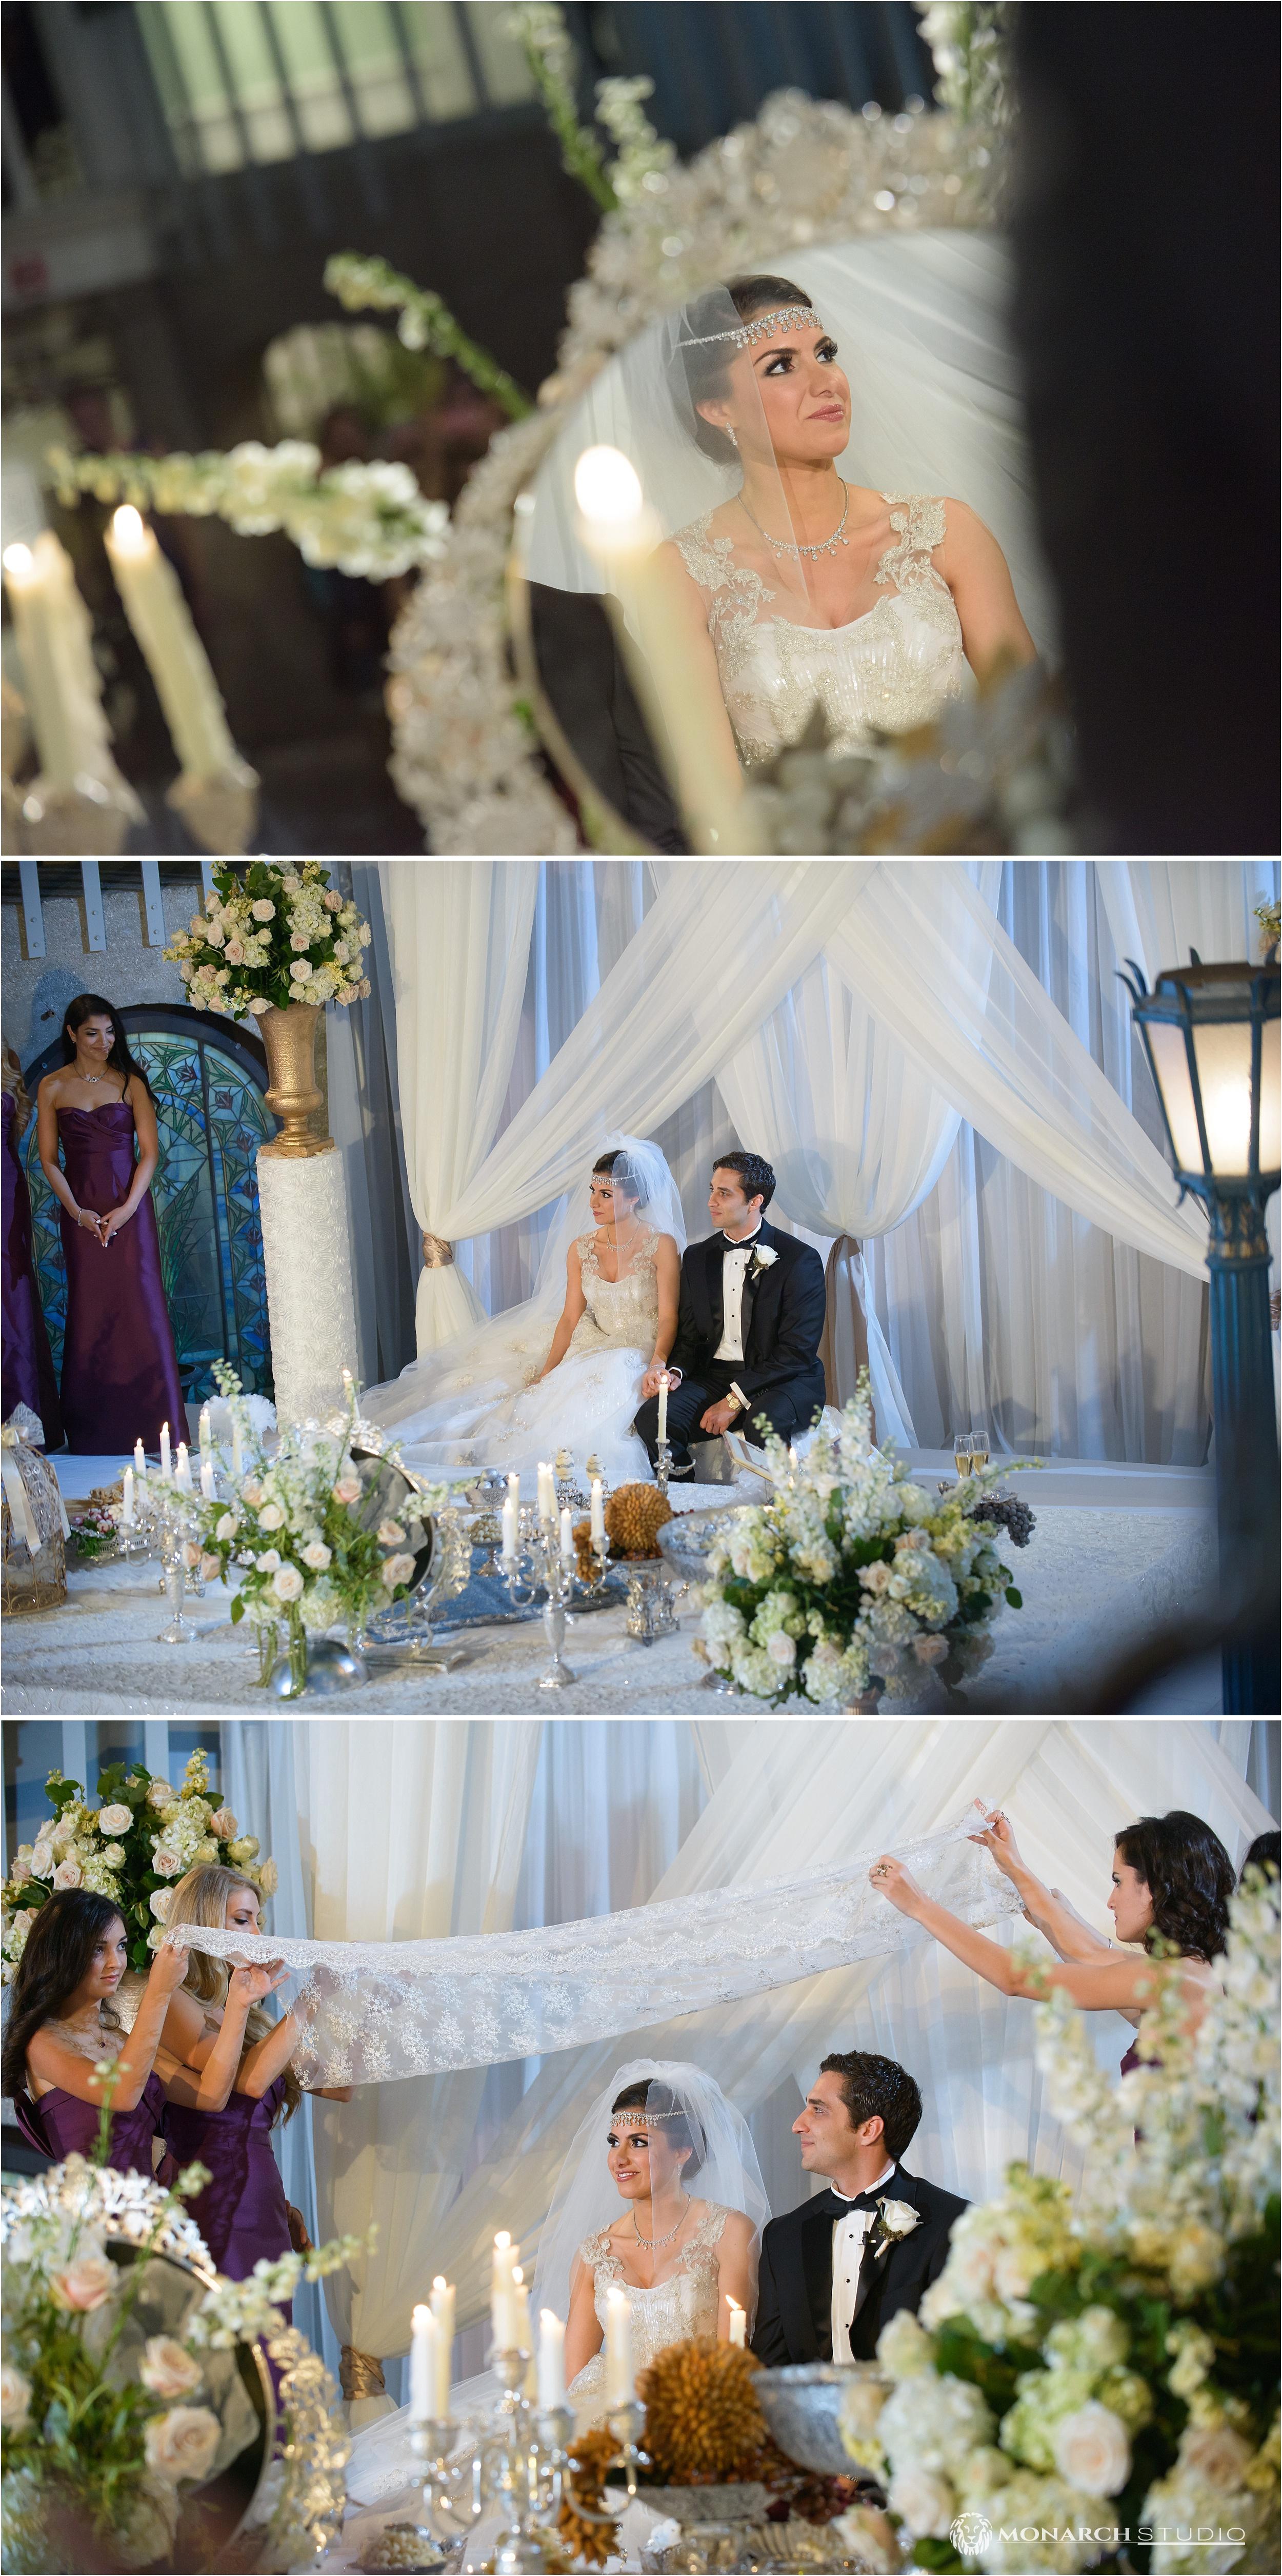 Persian-Aghd-Wedding-Photographer- سفره عقد-029.jpg